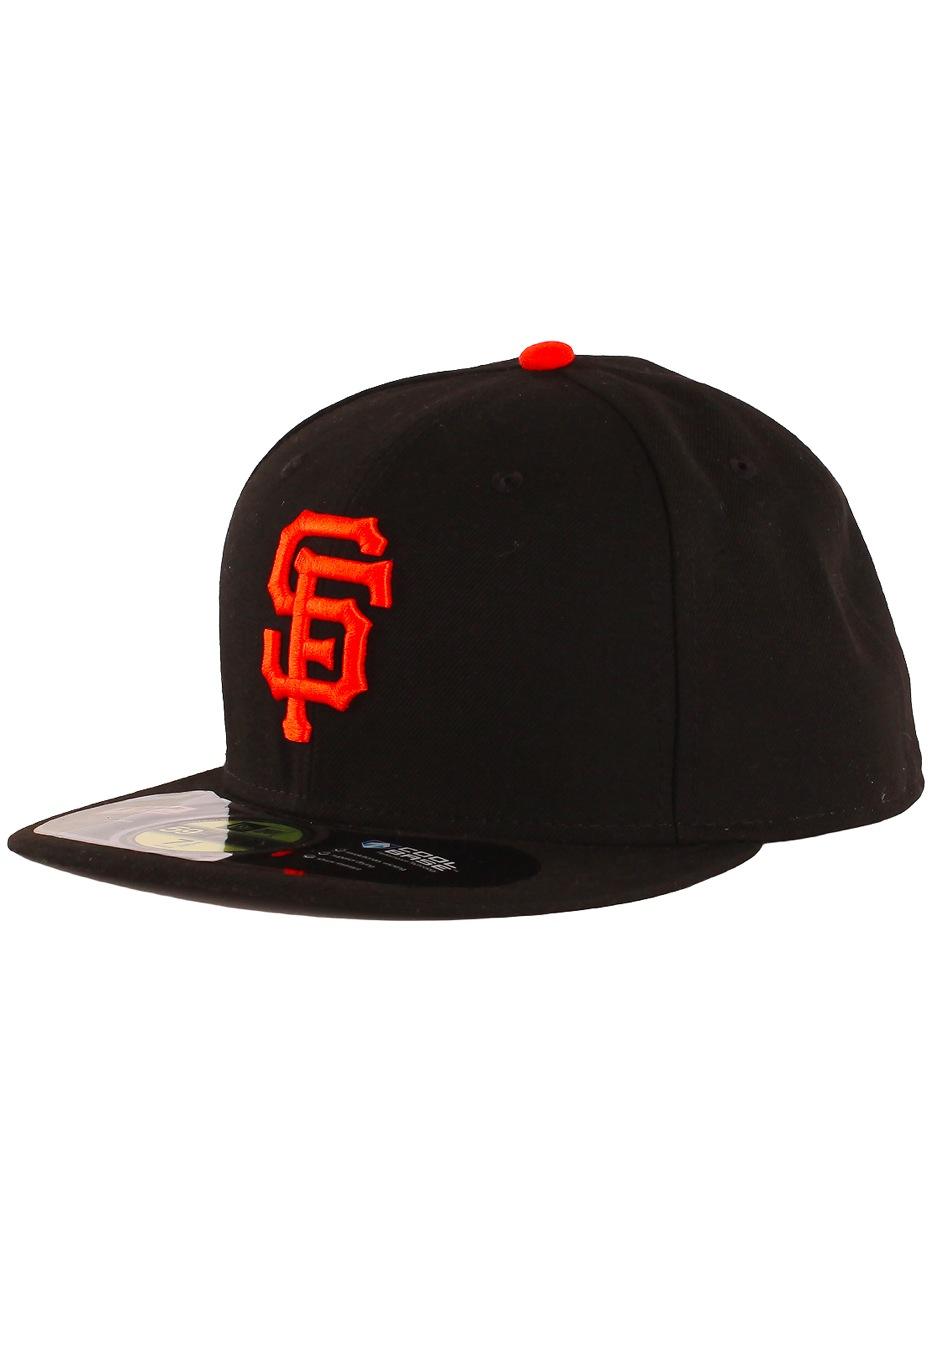 72b8e3a517928 New Era - AC Performance San Francisco Giants Game Black Orange - Cap -  Streetwear Shop - Impericon.com UK